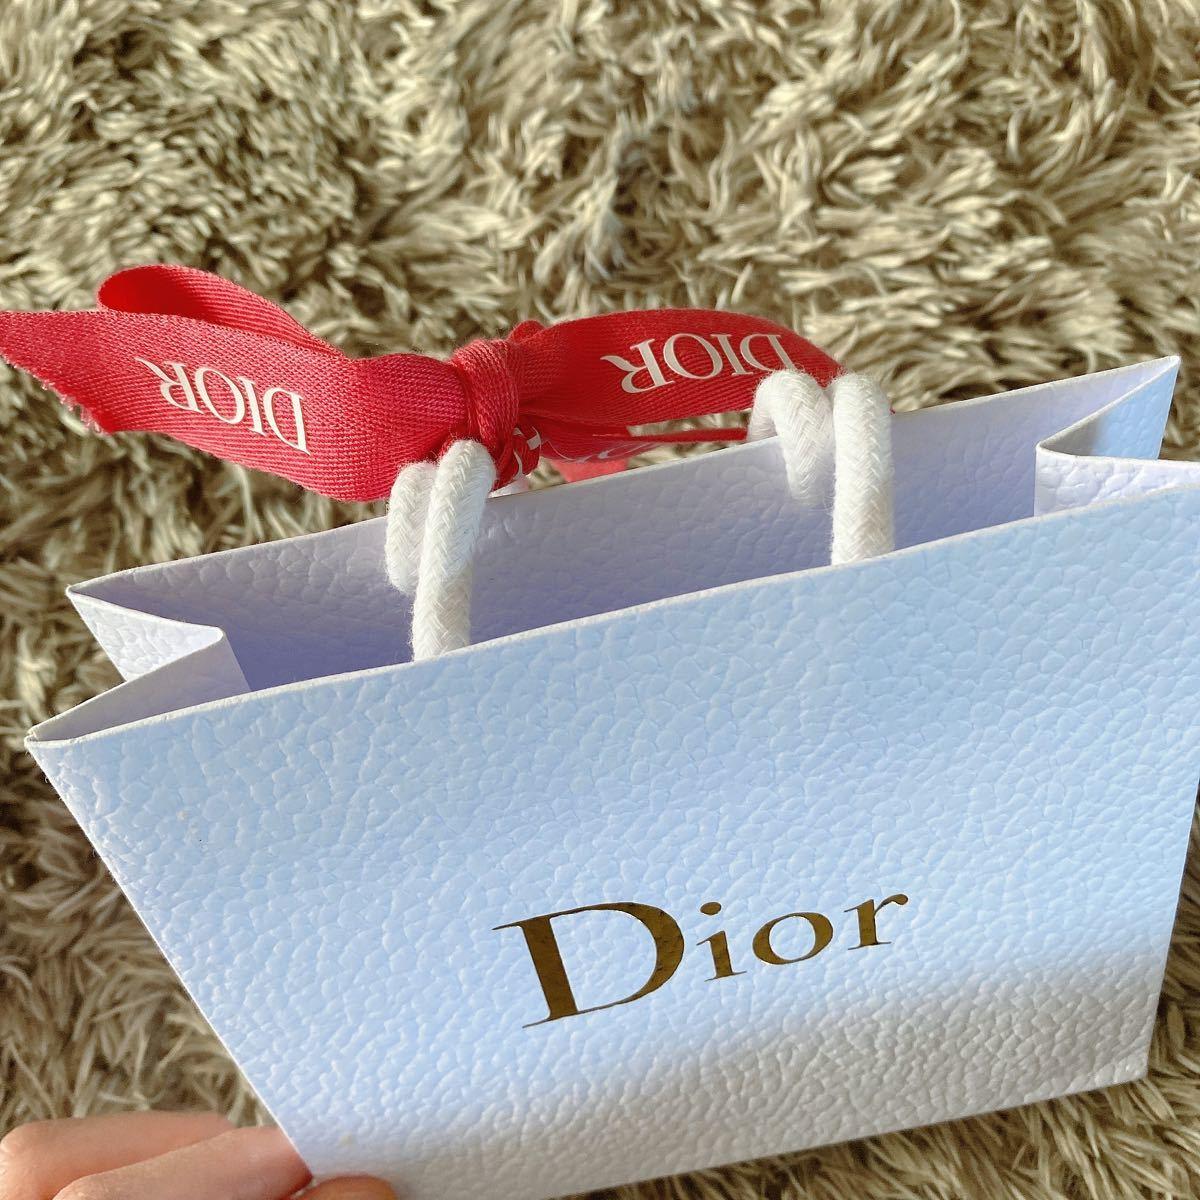 Dior 紙袋 マキシマイザー マキシマイザー001